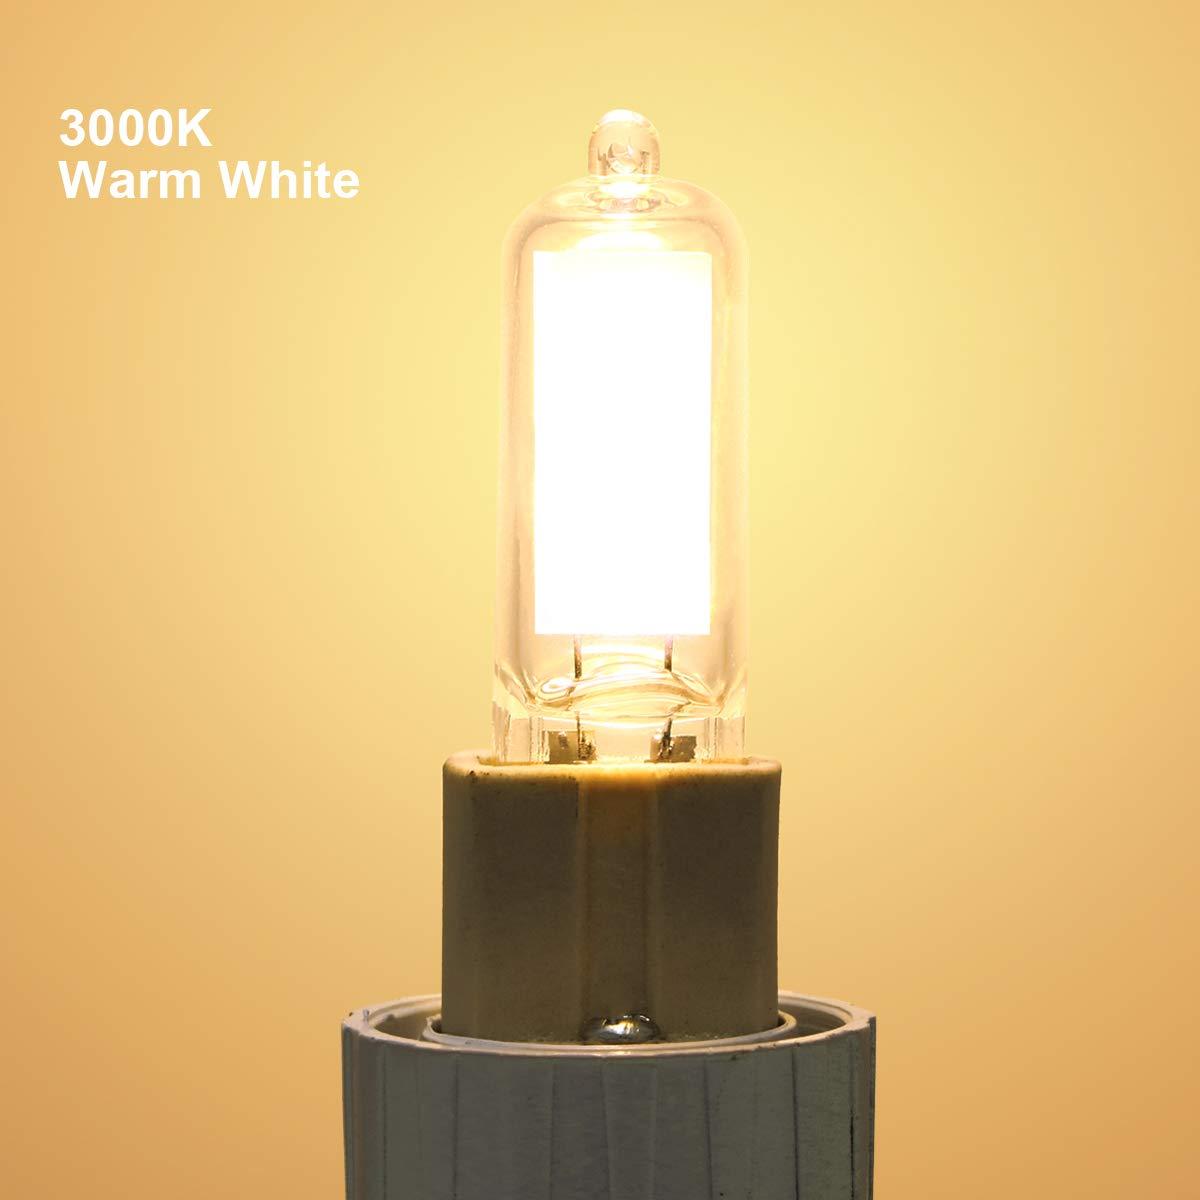 G9 L/ámparas LED 2W Equivalente a 20W Hal/ógena 360/° /Ángulo de Haz y No Regulable Vicloon G9 LED Bombillas G9 COB L/ámpara Blanco C/álido 3000K 200LM Pack de 6 AC 220-240V